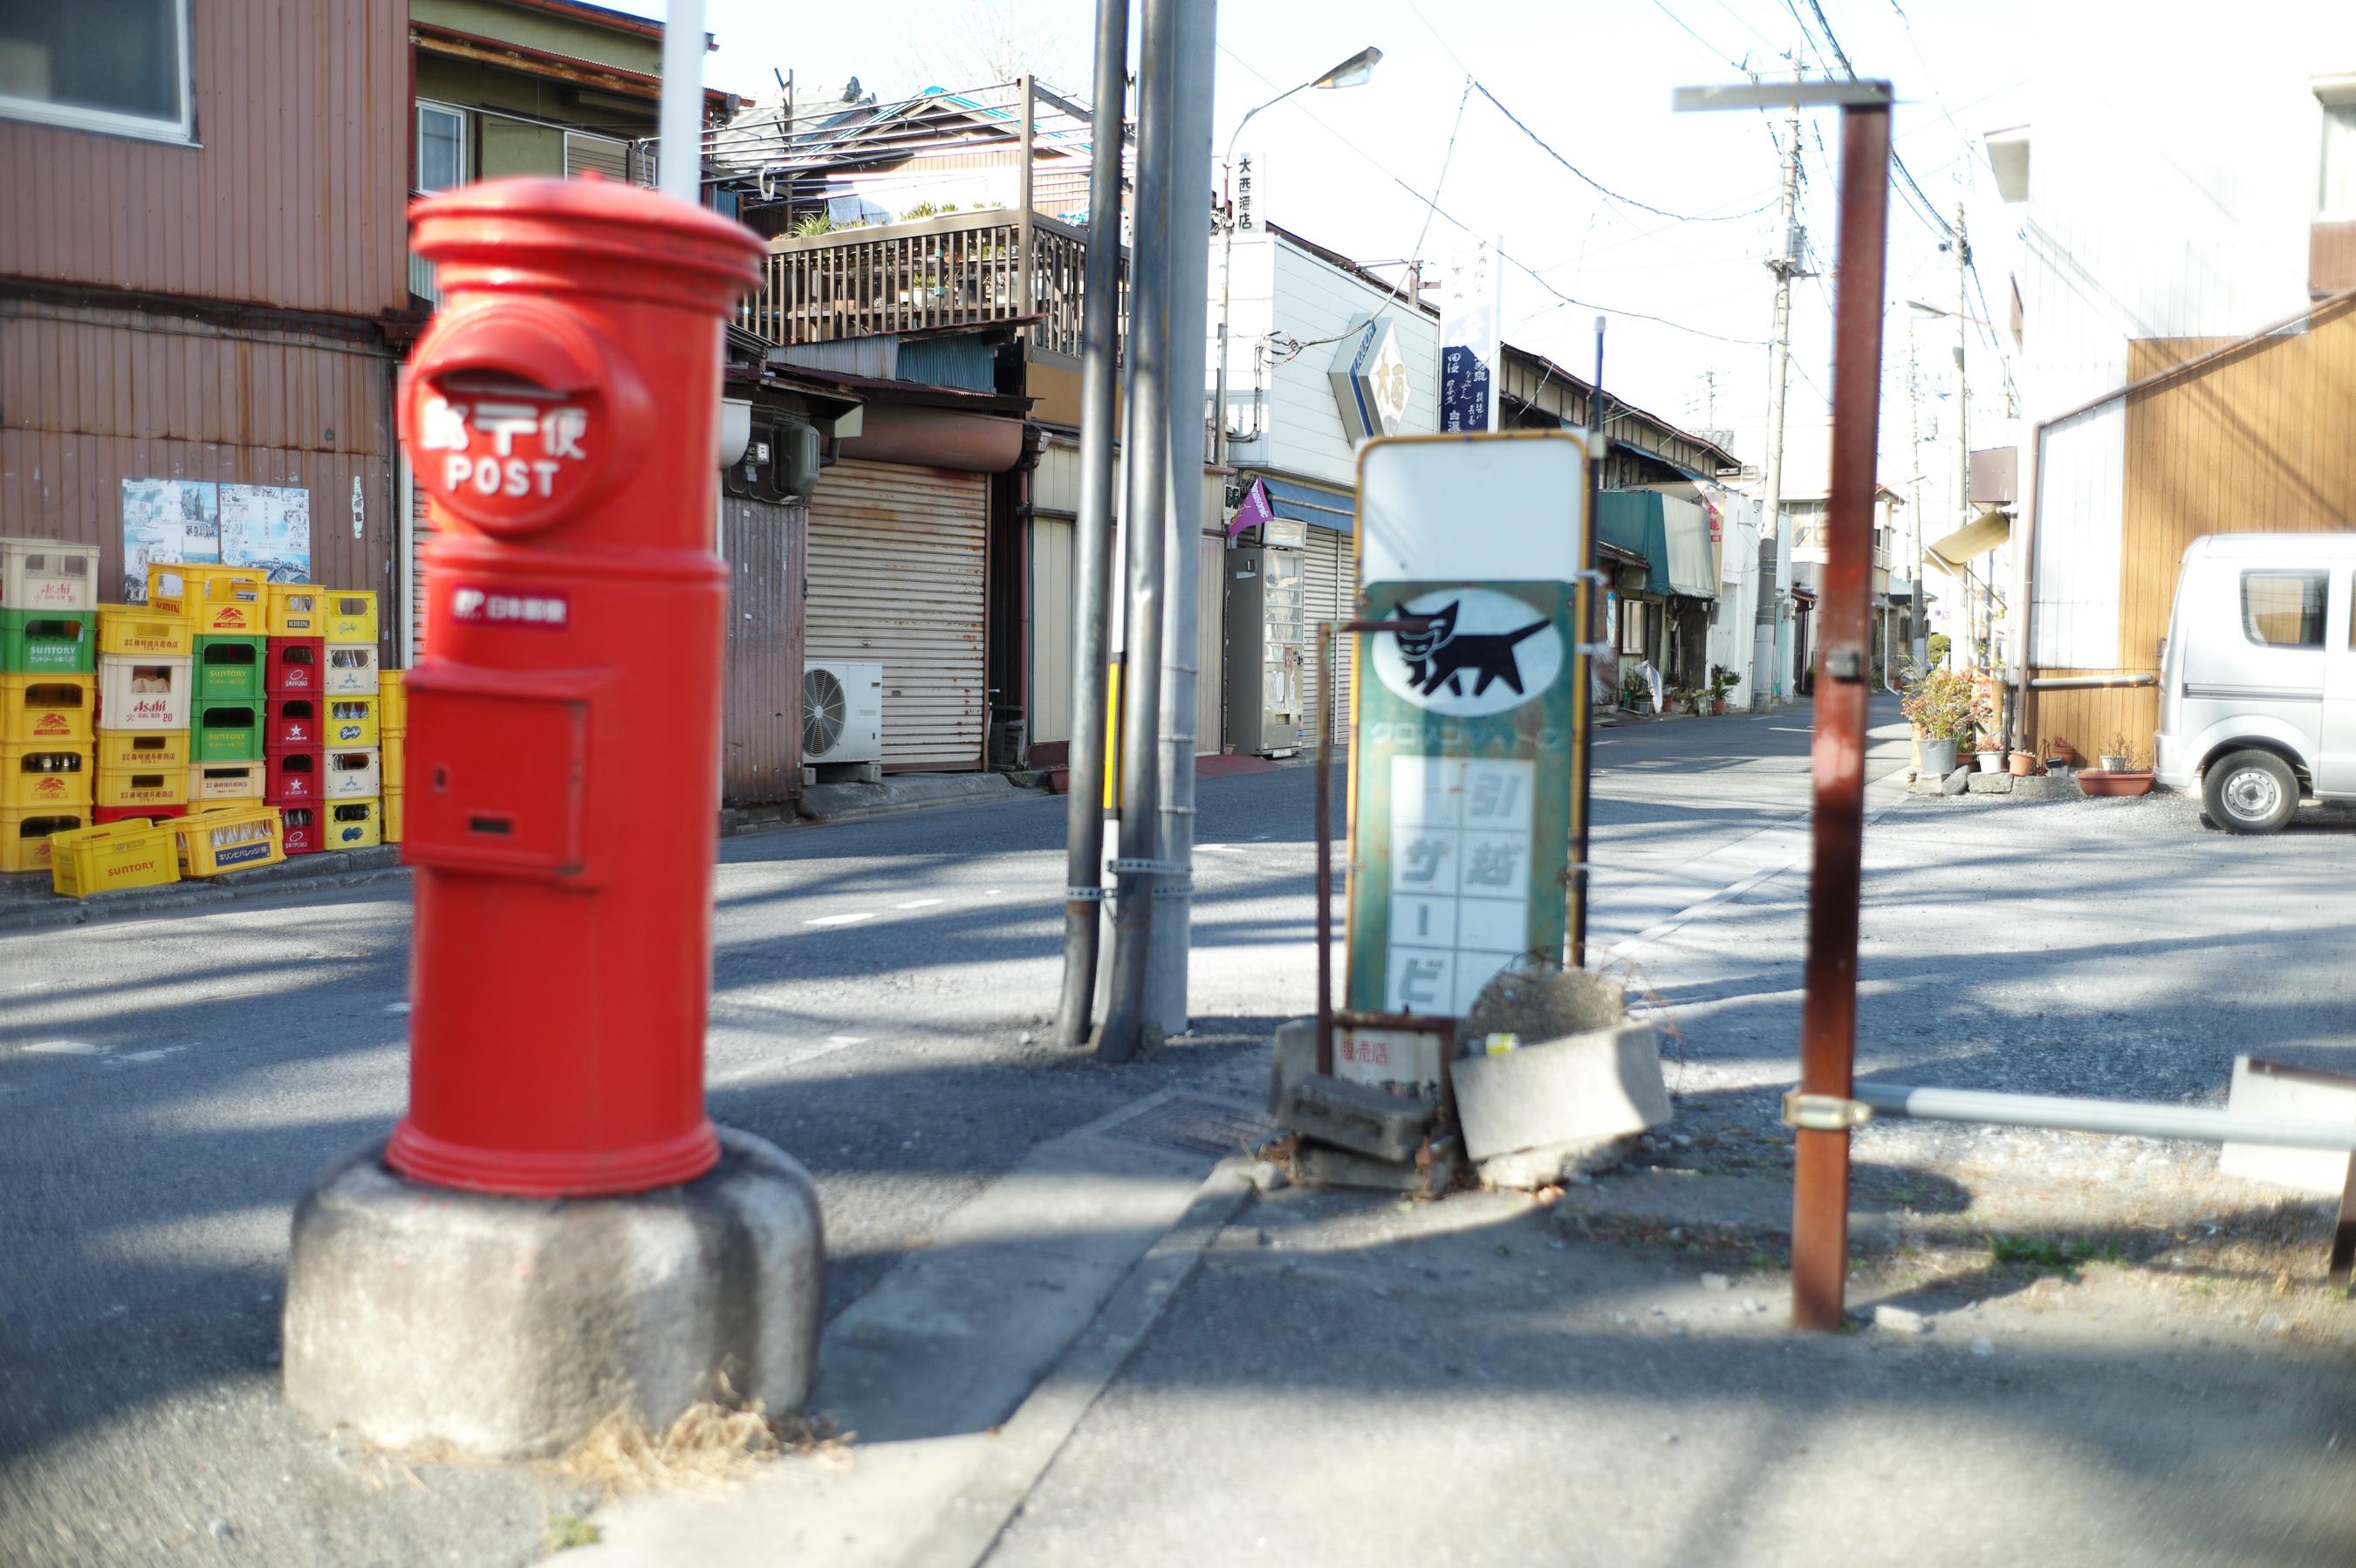 f:id:aoyama-takuro:20180211230117j:plain